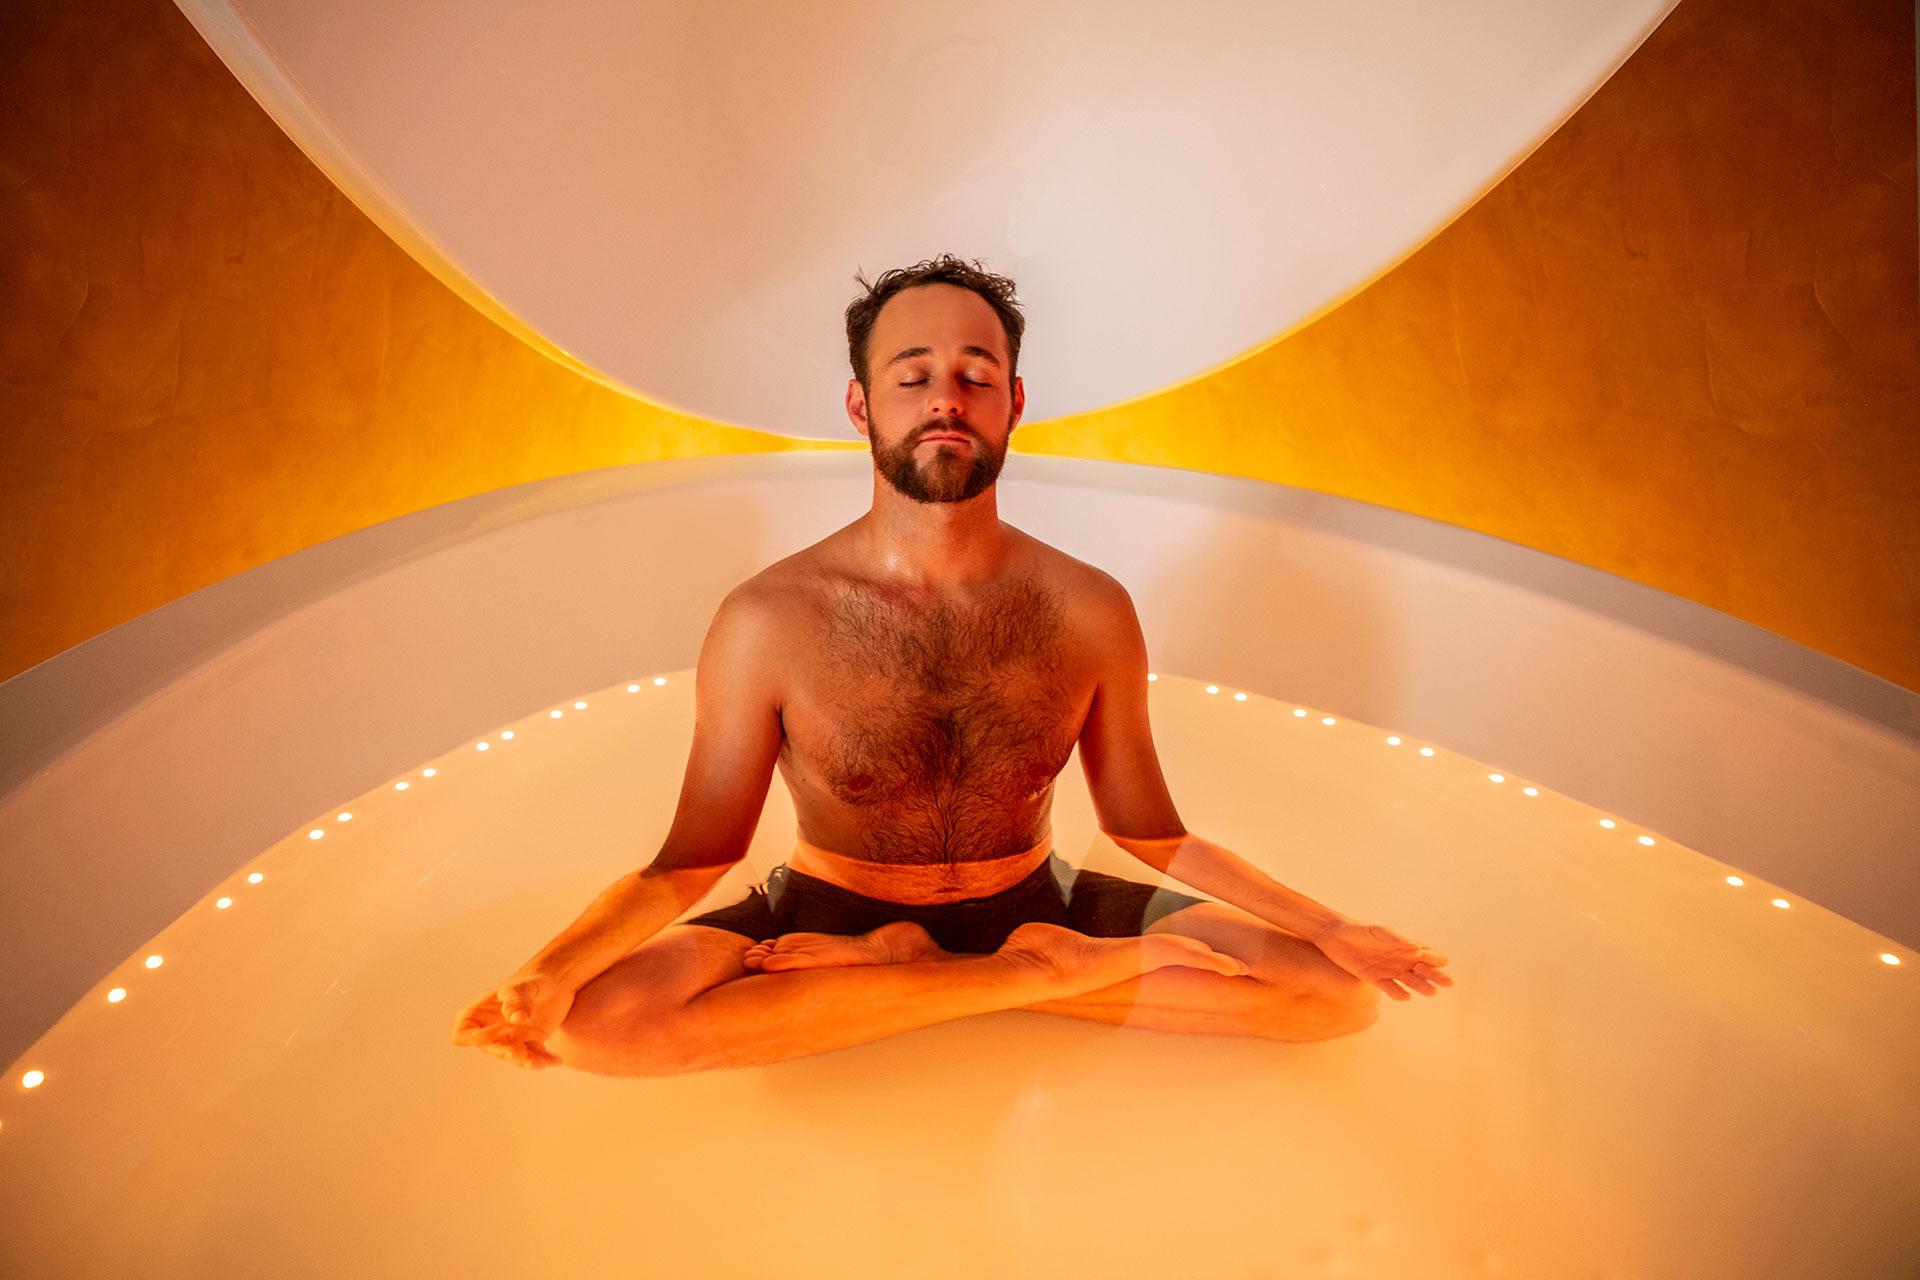 theta meditacija - theta stanje zavesti